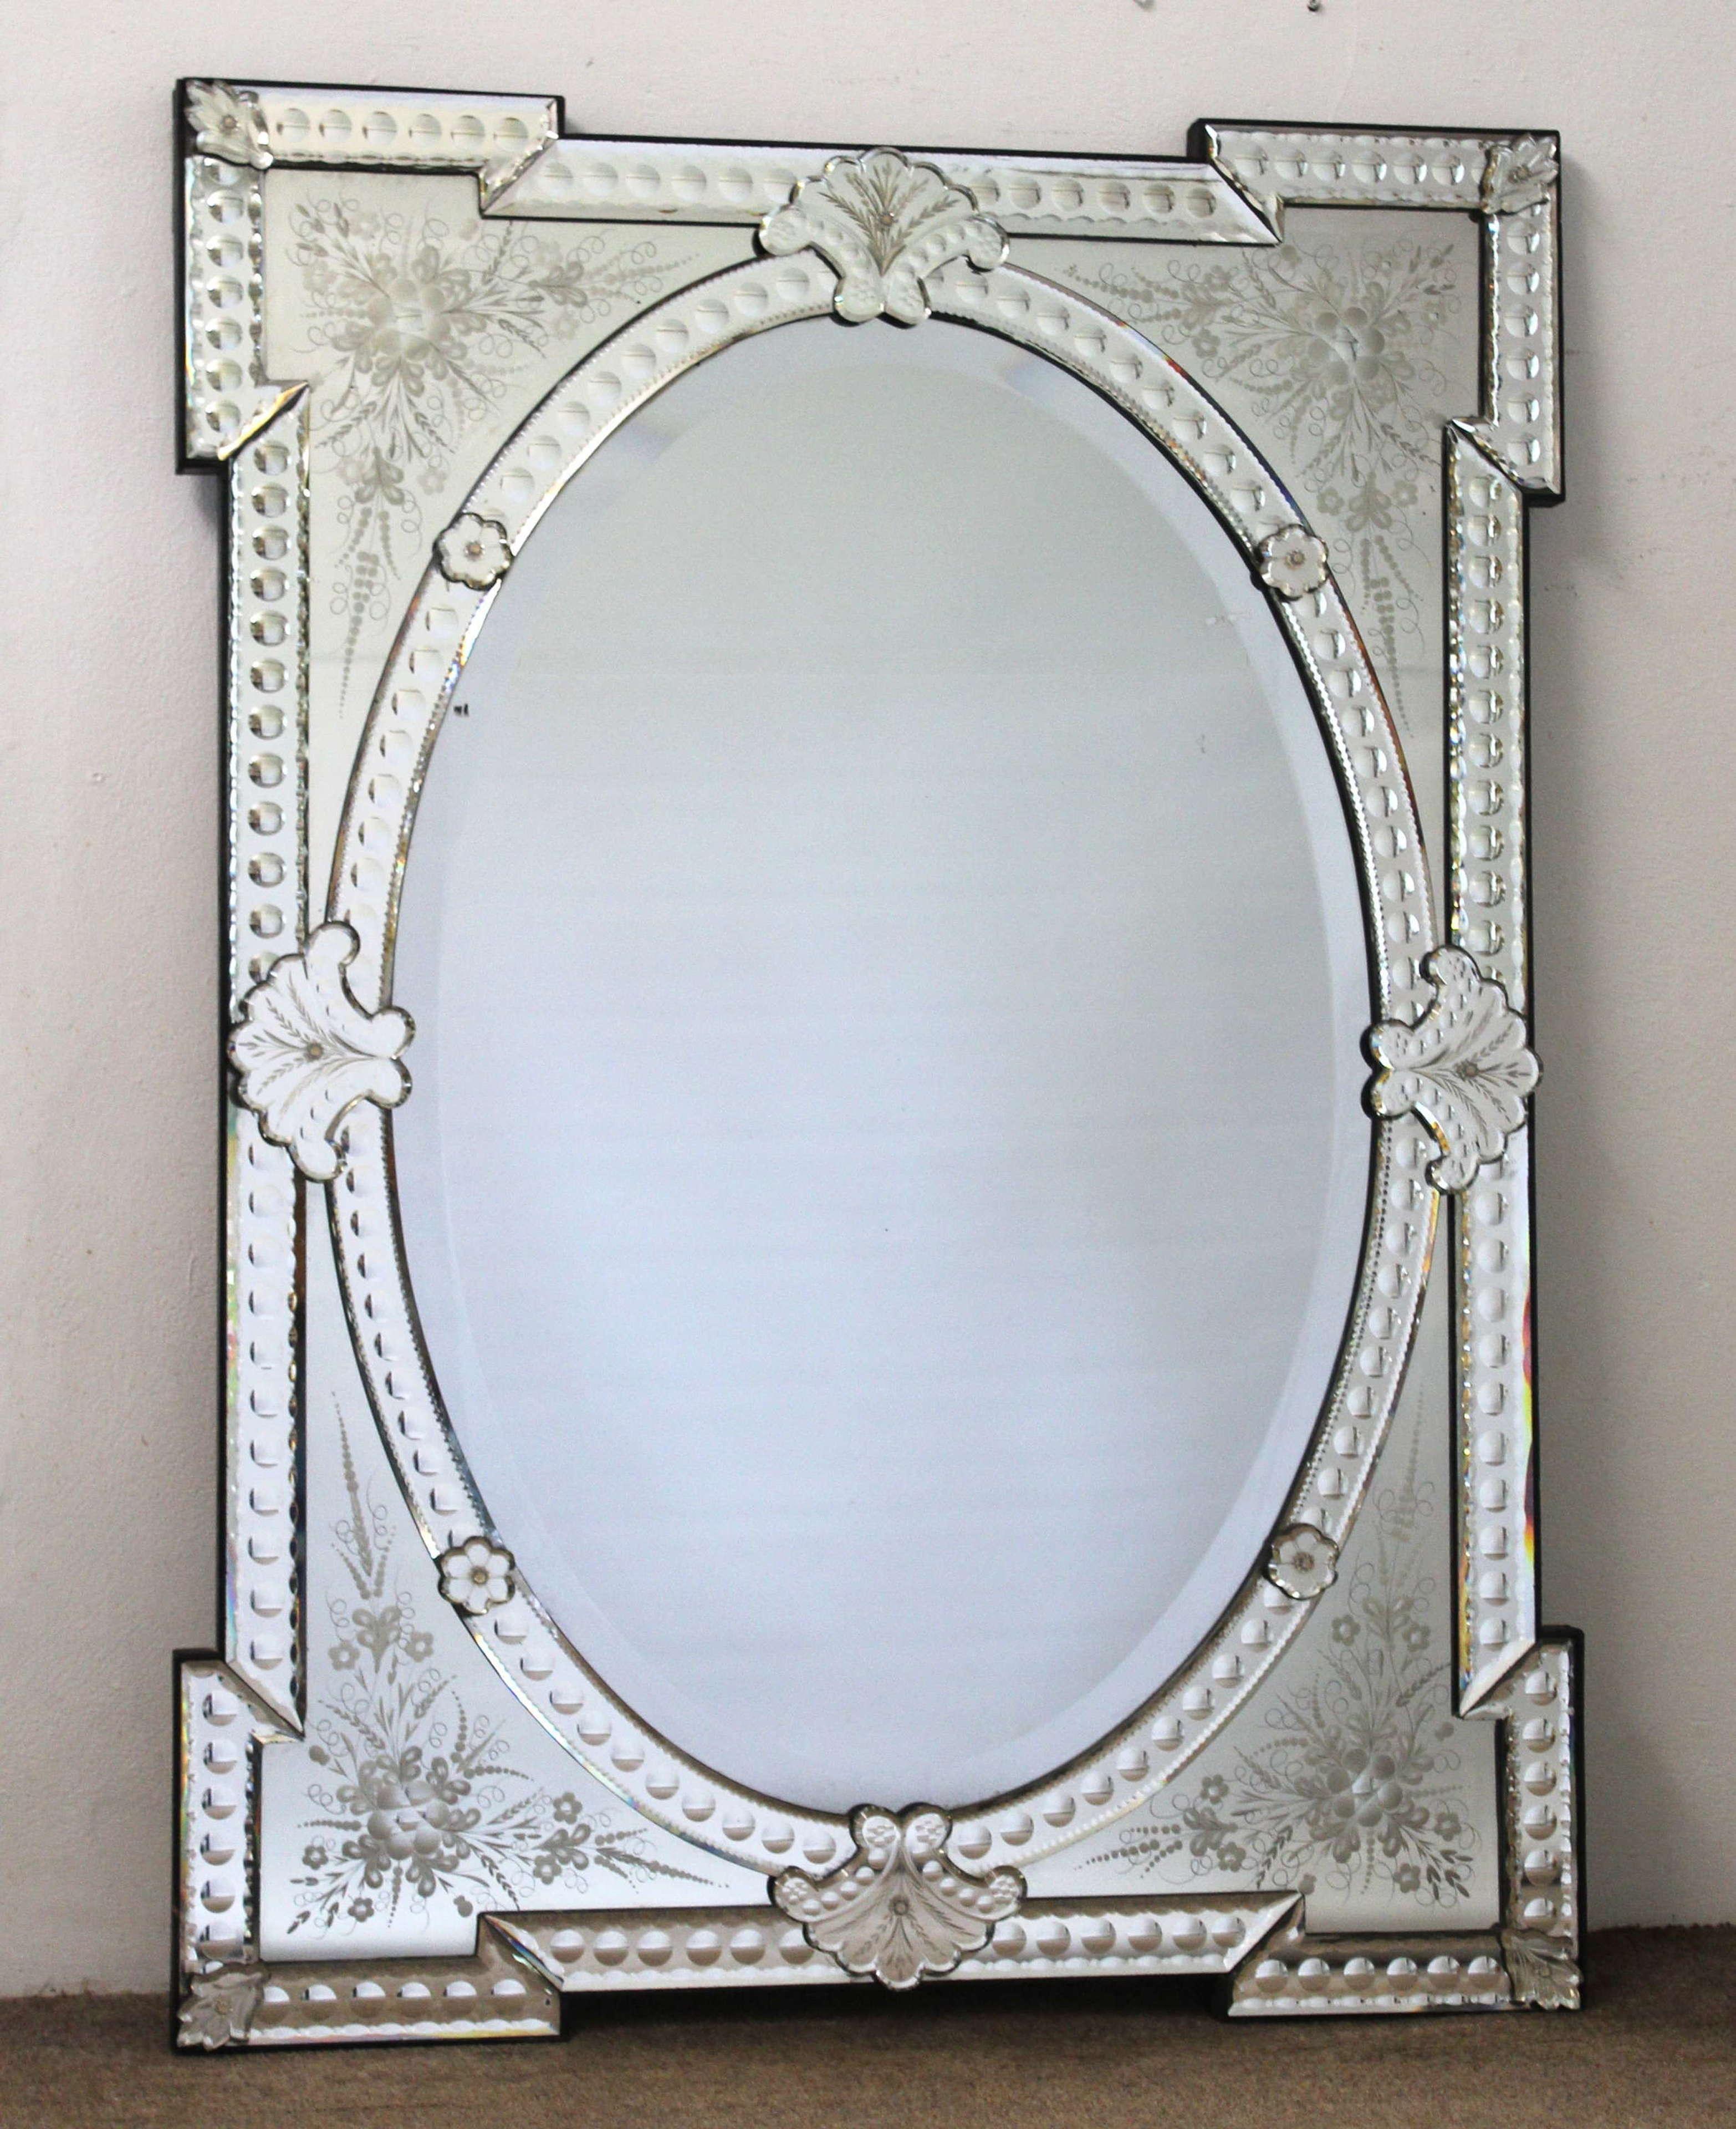 Antique rectangular Venetian mirror with oval centre